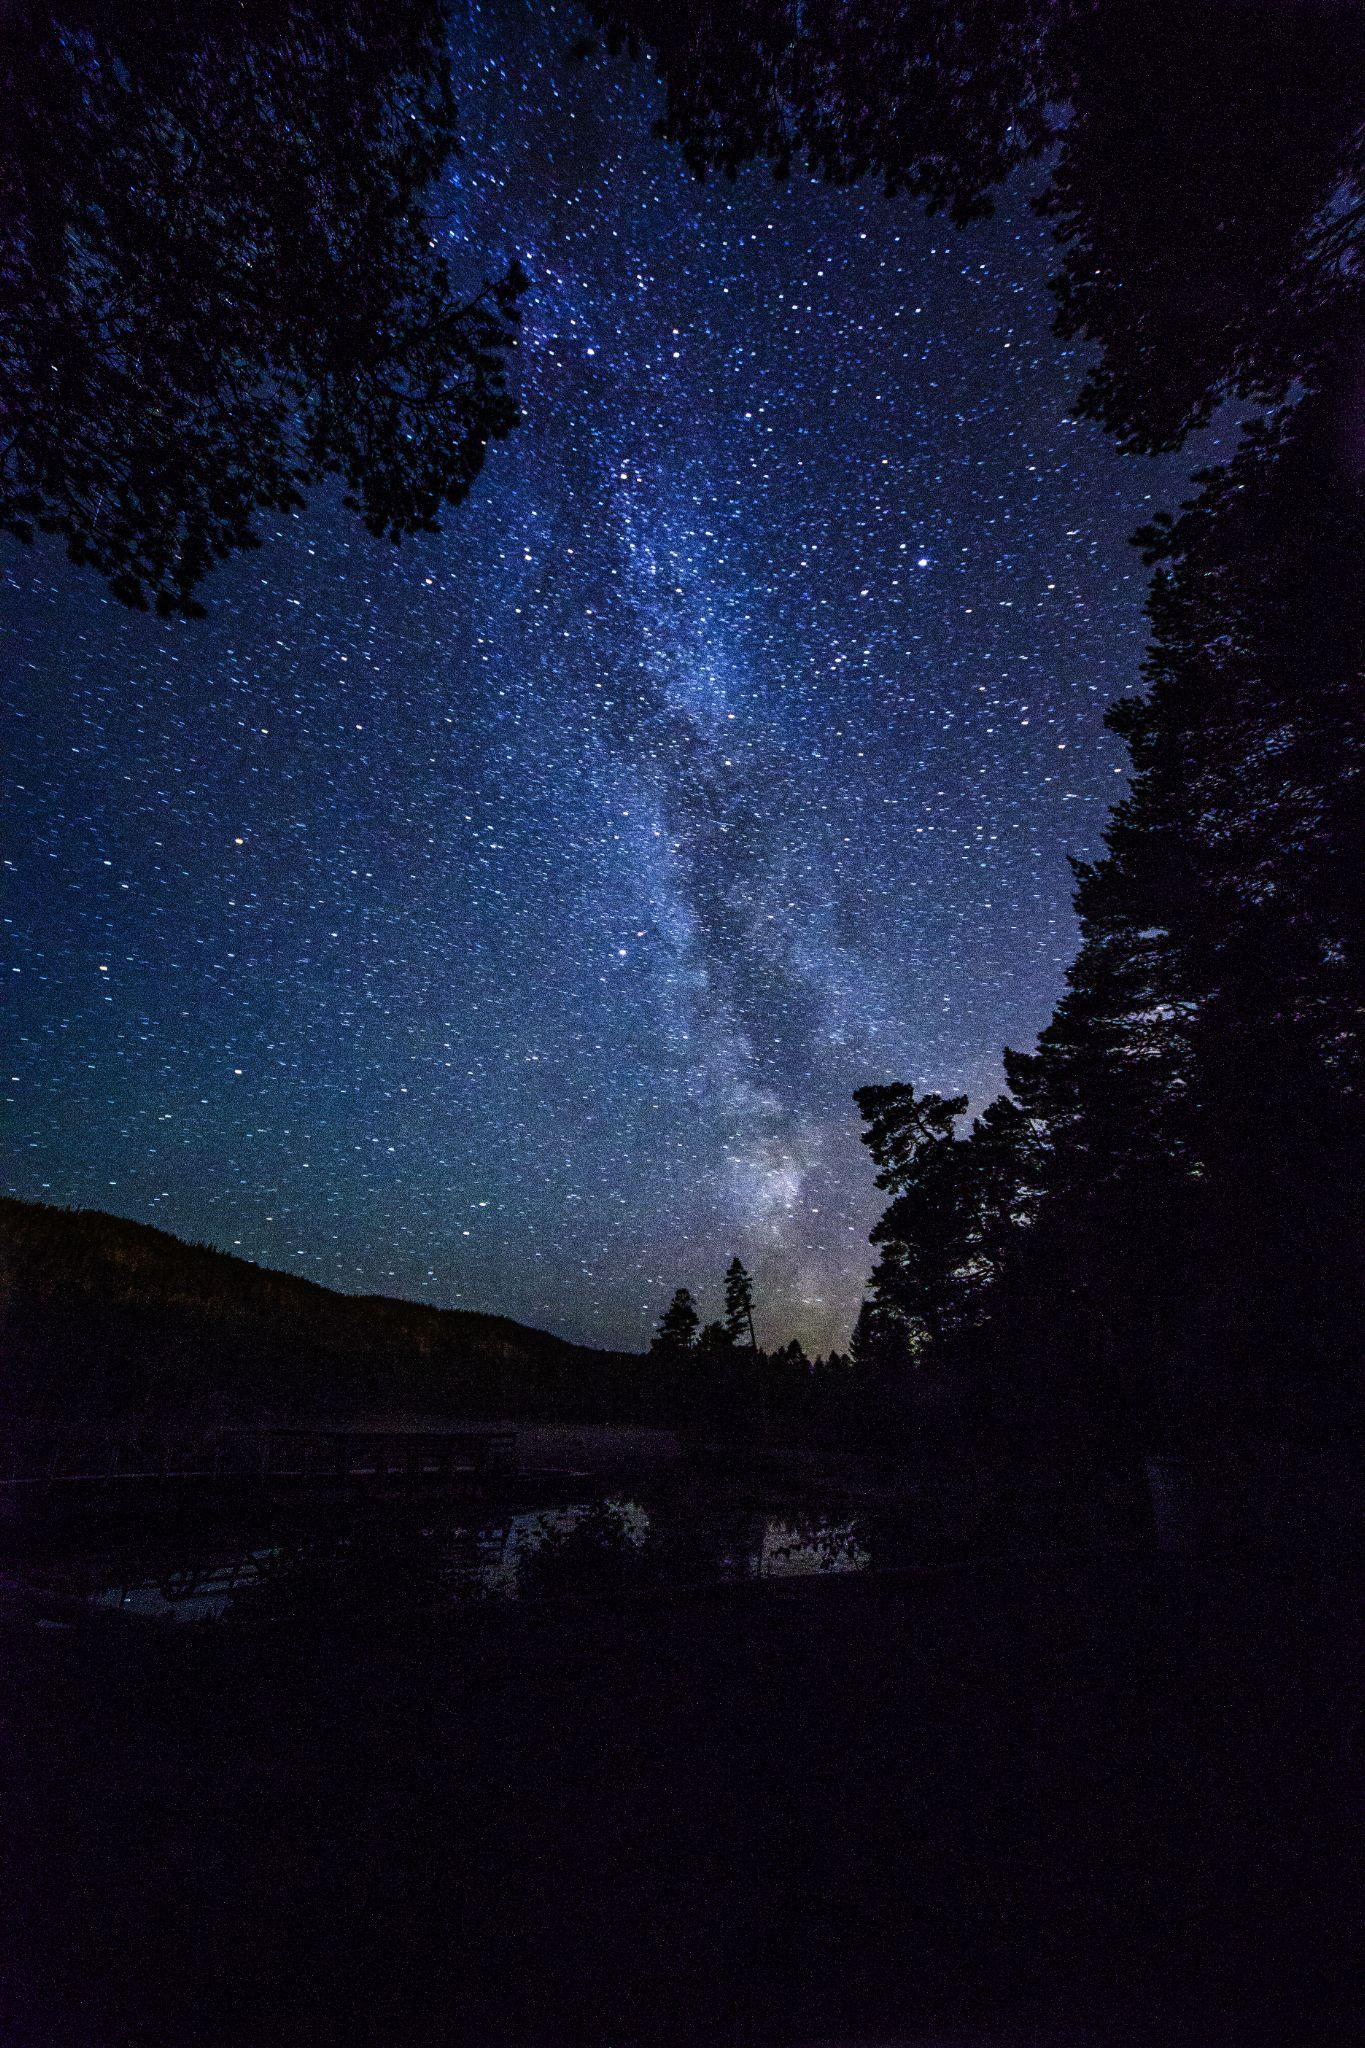 Milky Way on Stavsjøen by Odd Rune Wang